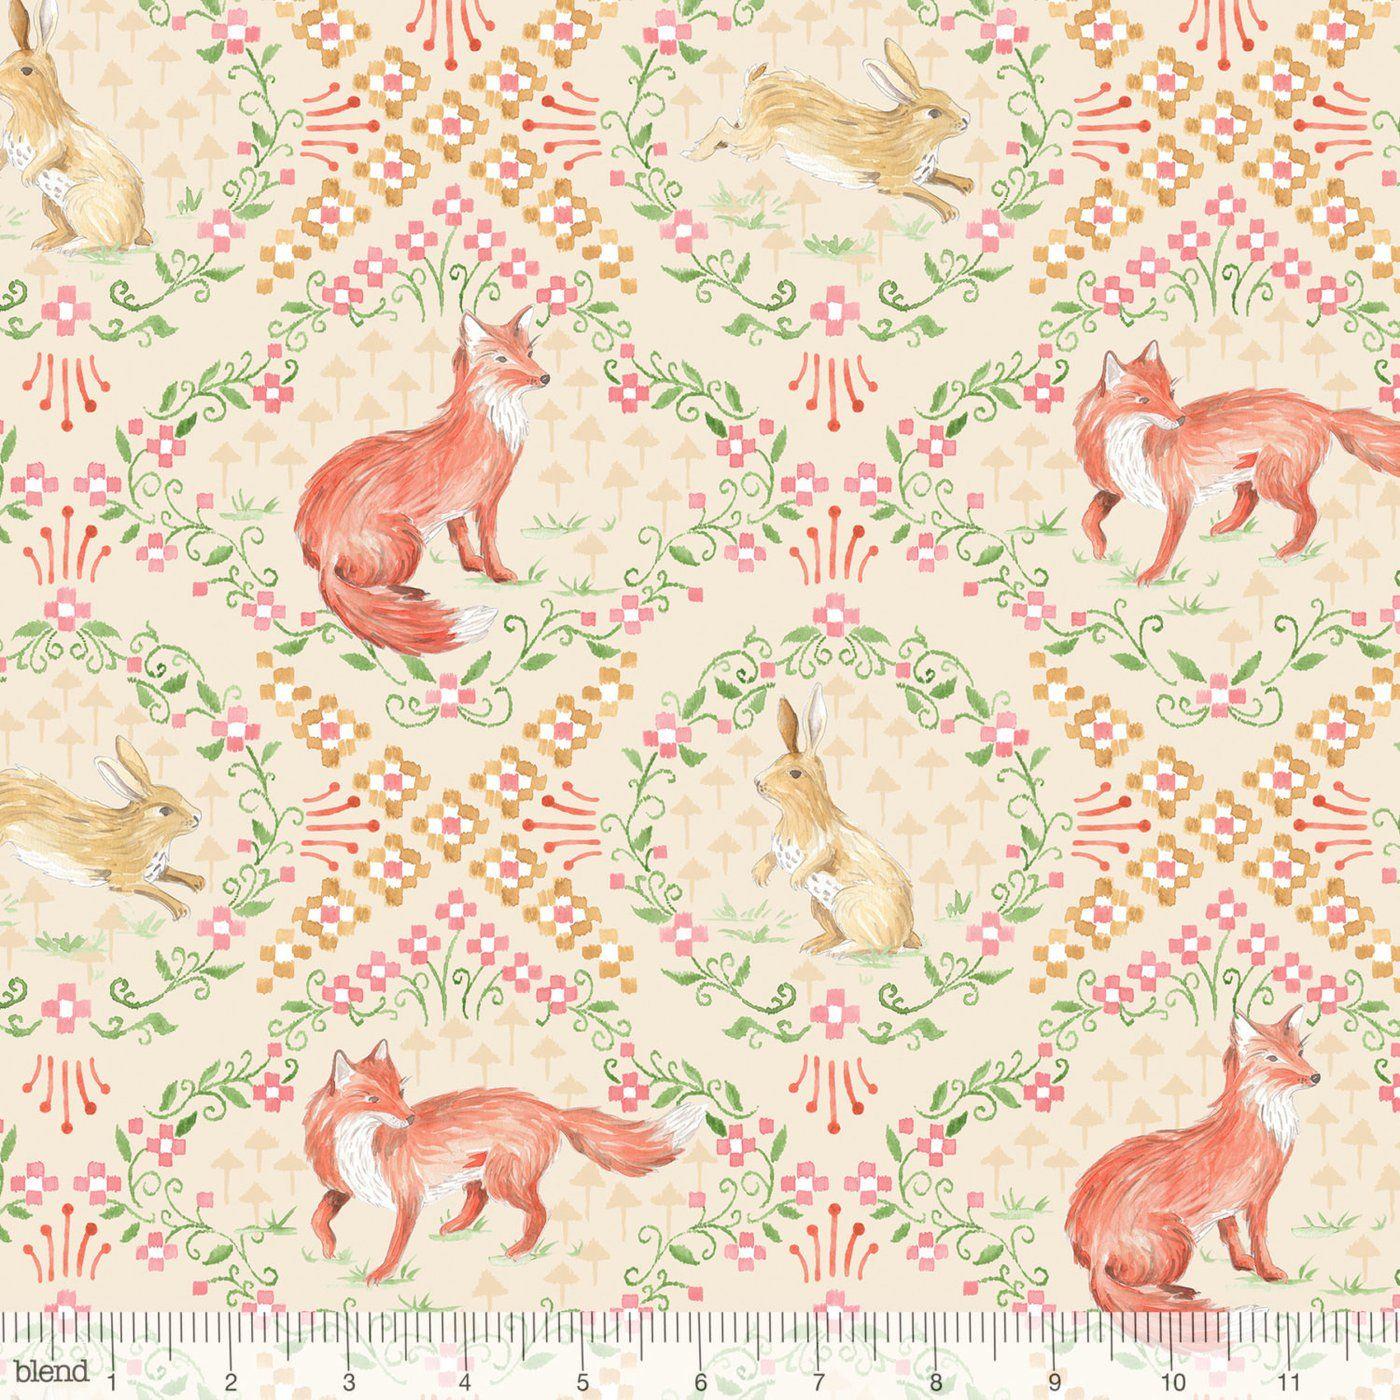 Fox Fabric Rabbit Fabric Bunny Cute Animal Material